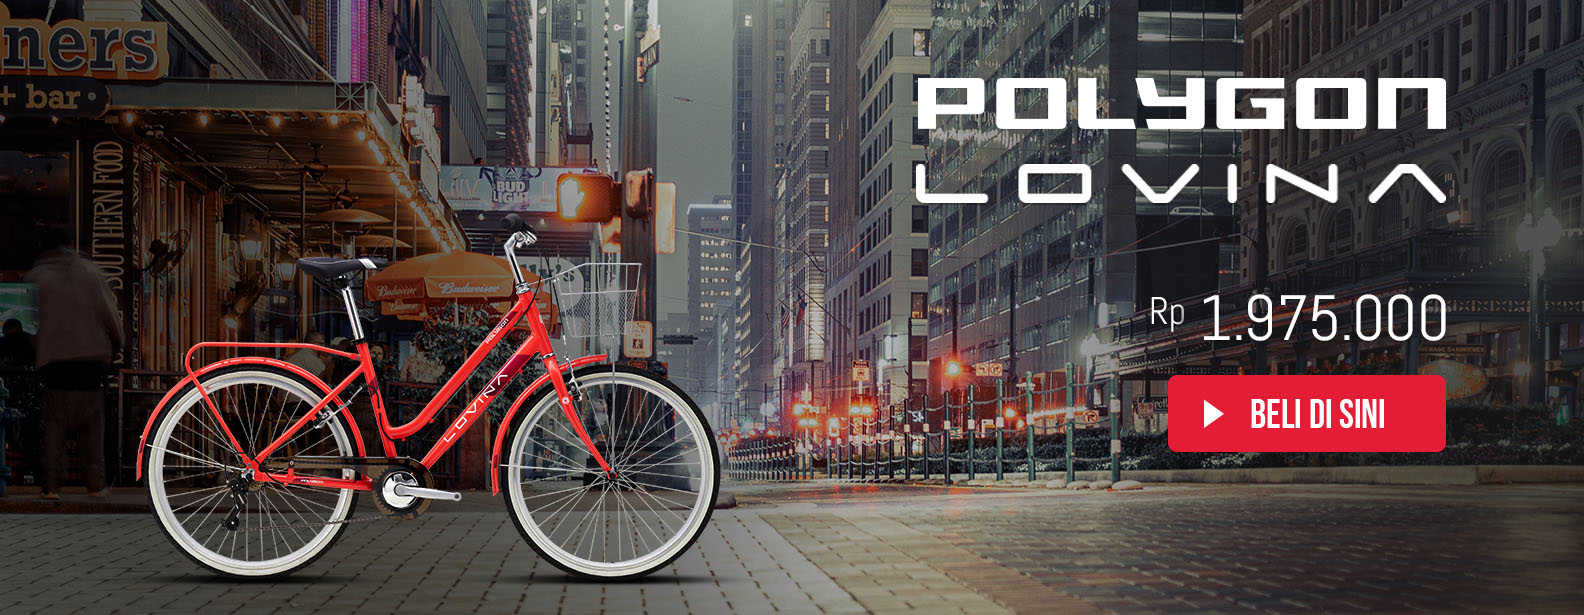 Polygon Sepeda Lovina